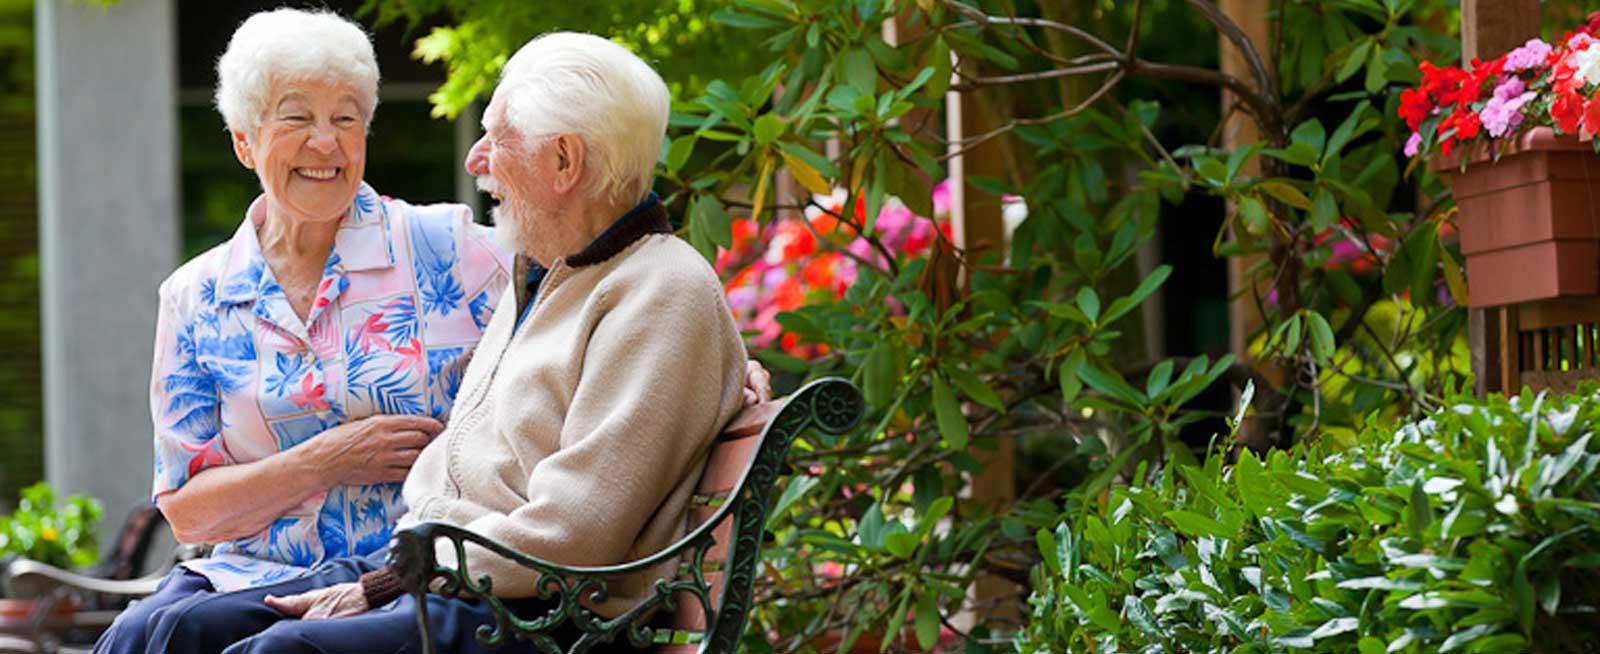 VRS Lakeside Gardens Seniors Community Your Lifestyle happy senior residents conversing in garden